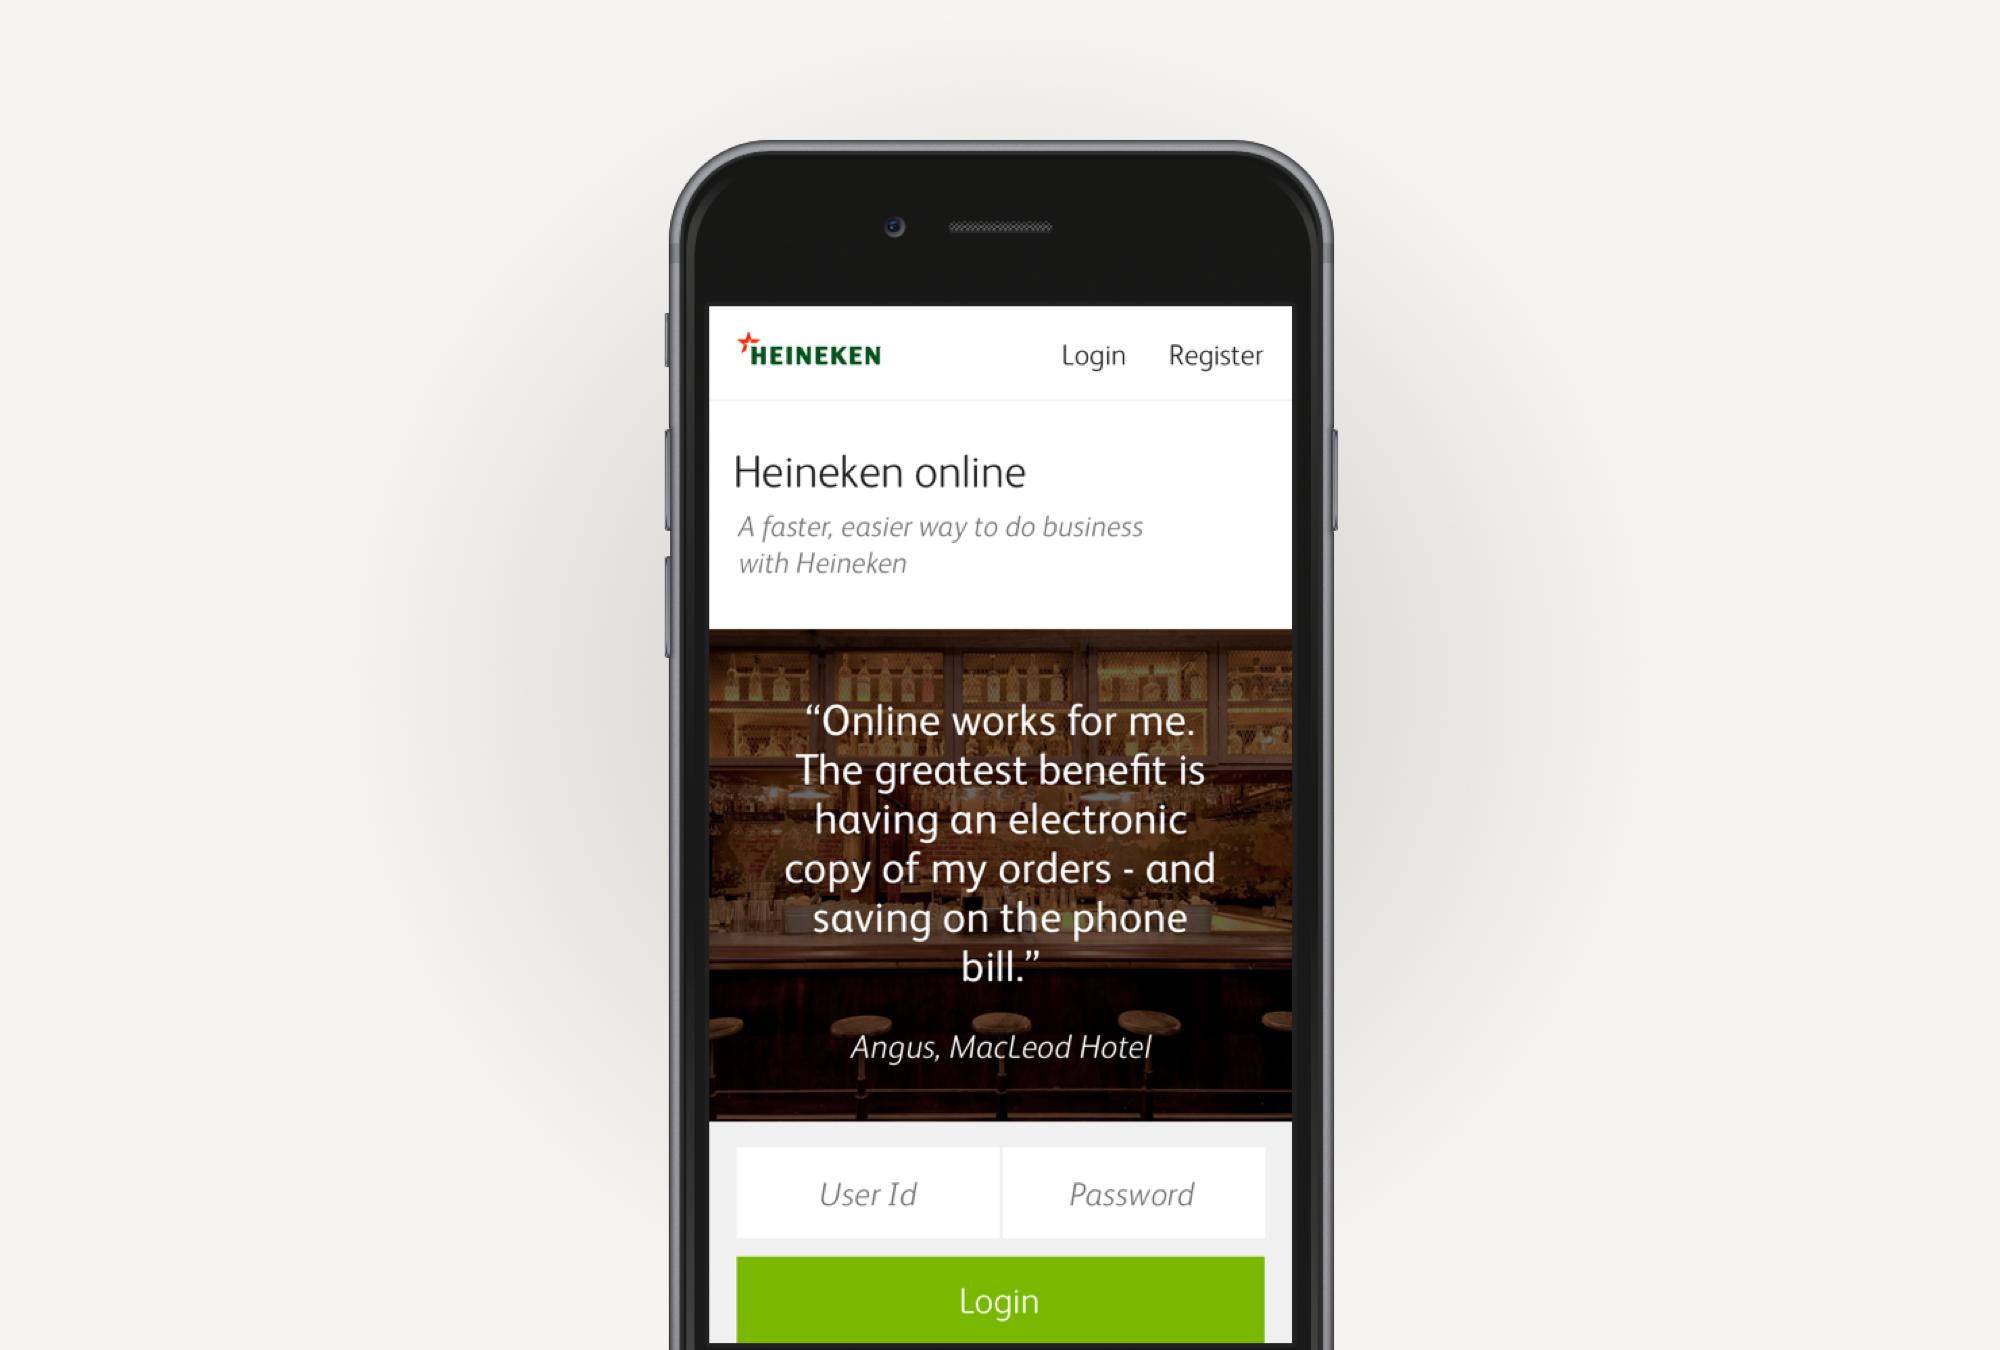 Heineken - Mobile experience strategy